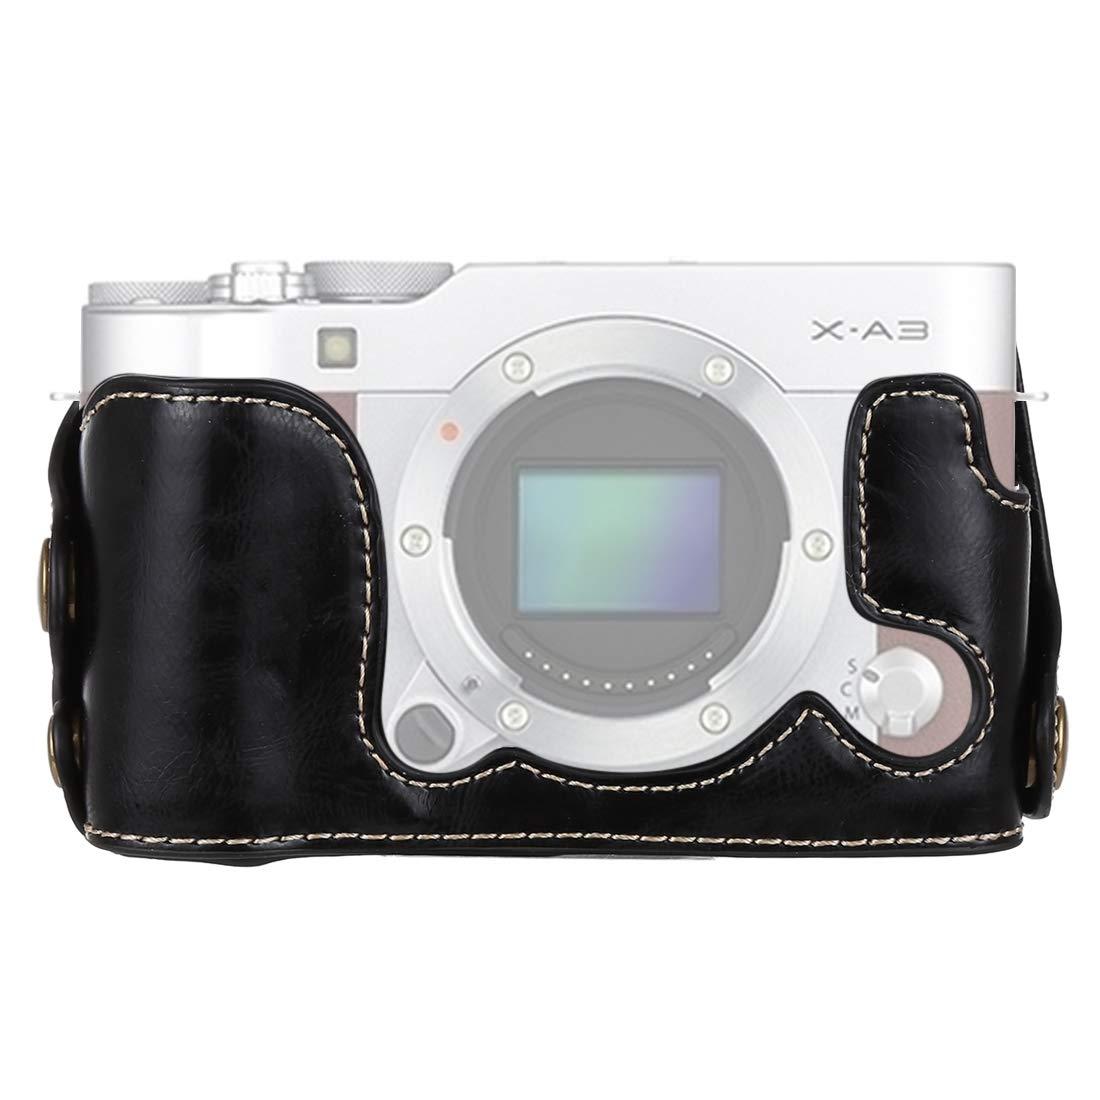 Dig 犬用骨 1/4インチねじ PUレザー カメラケースベース FUJIFILM X-A3/X-A10用, ブラック, DCA8790B  ブラック B07L944V4N